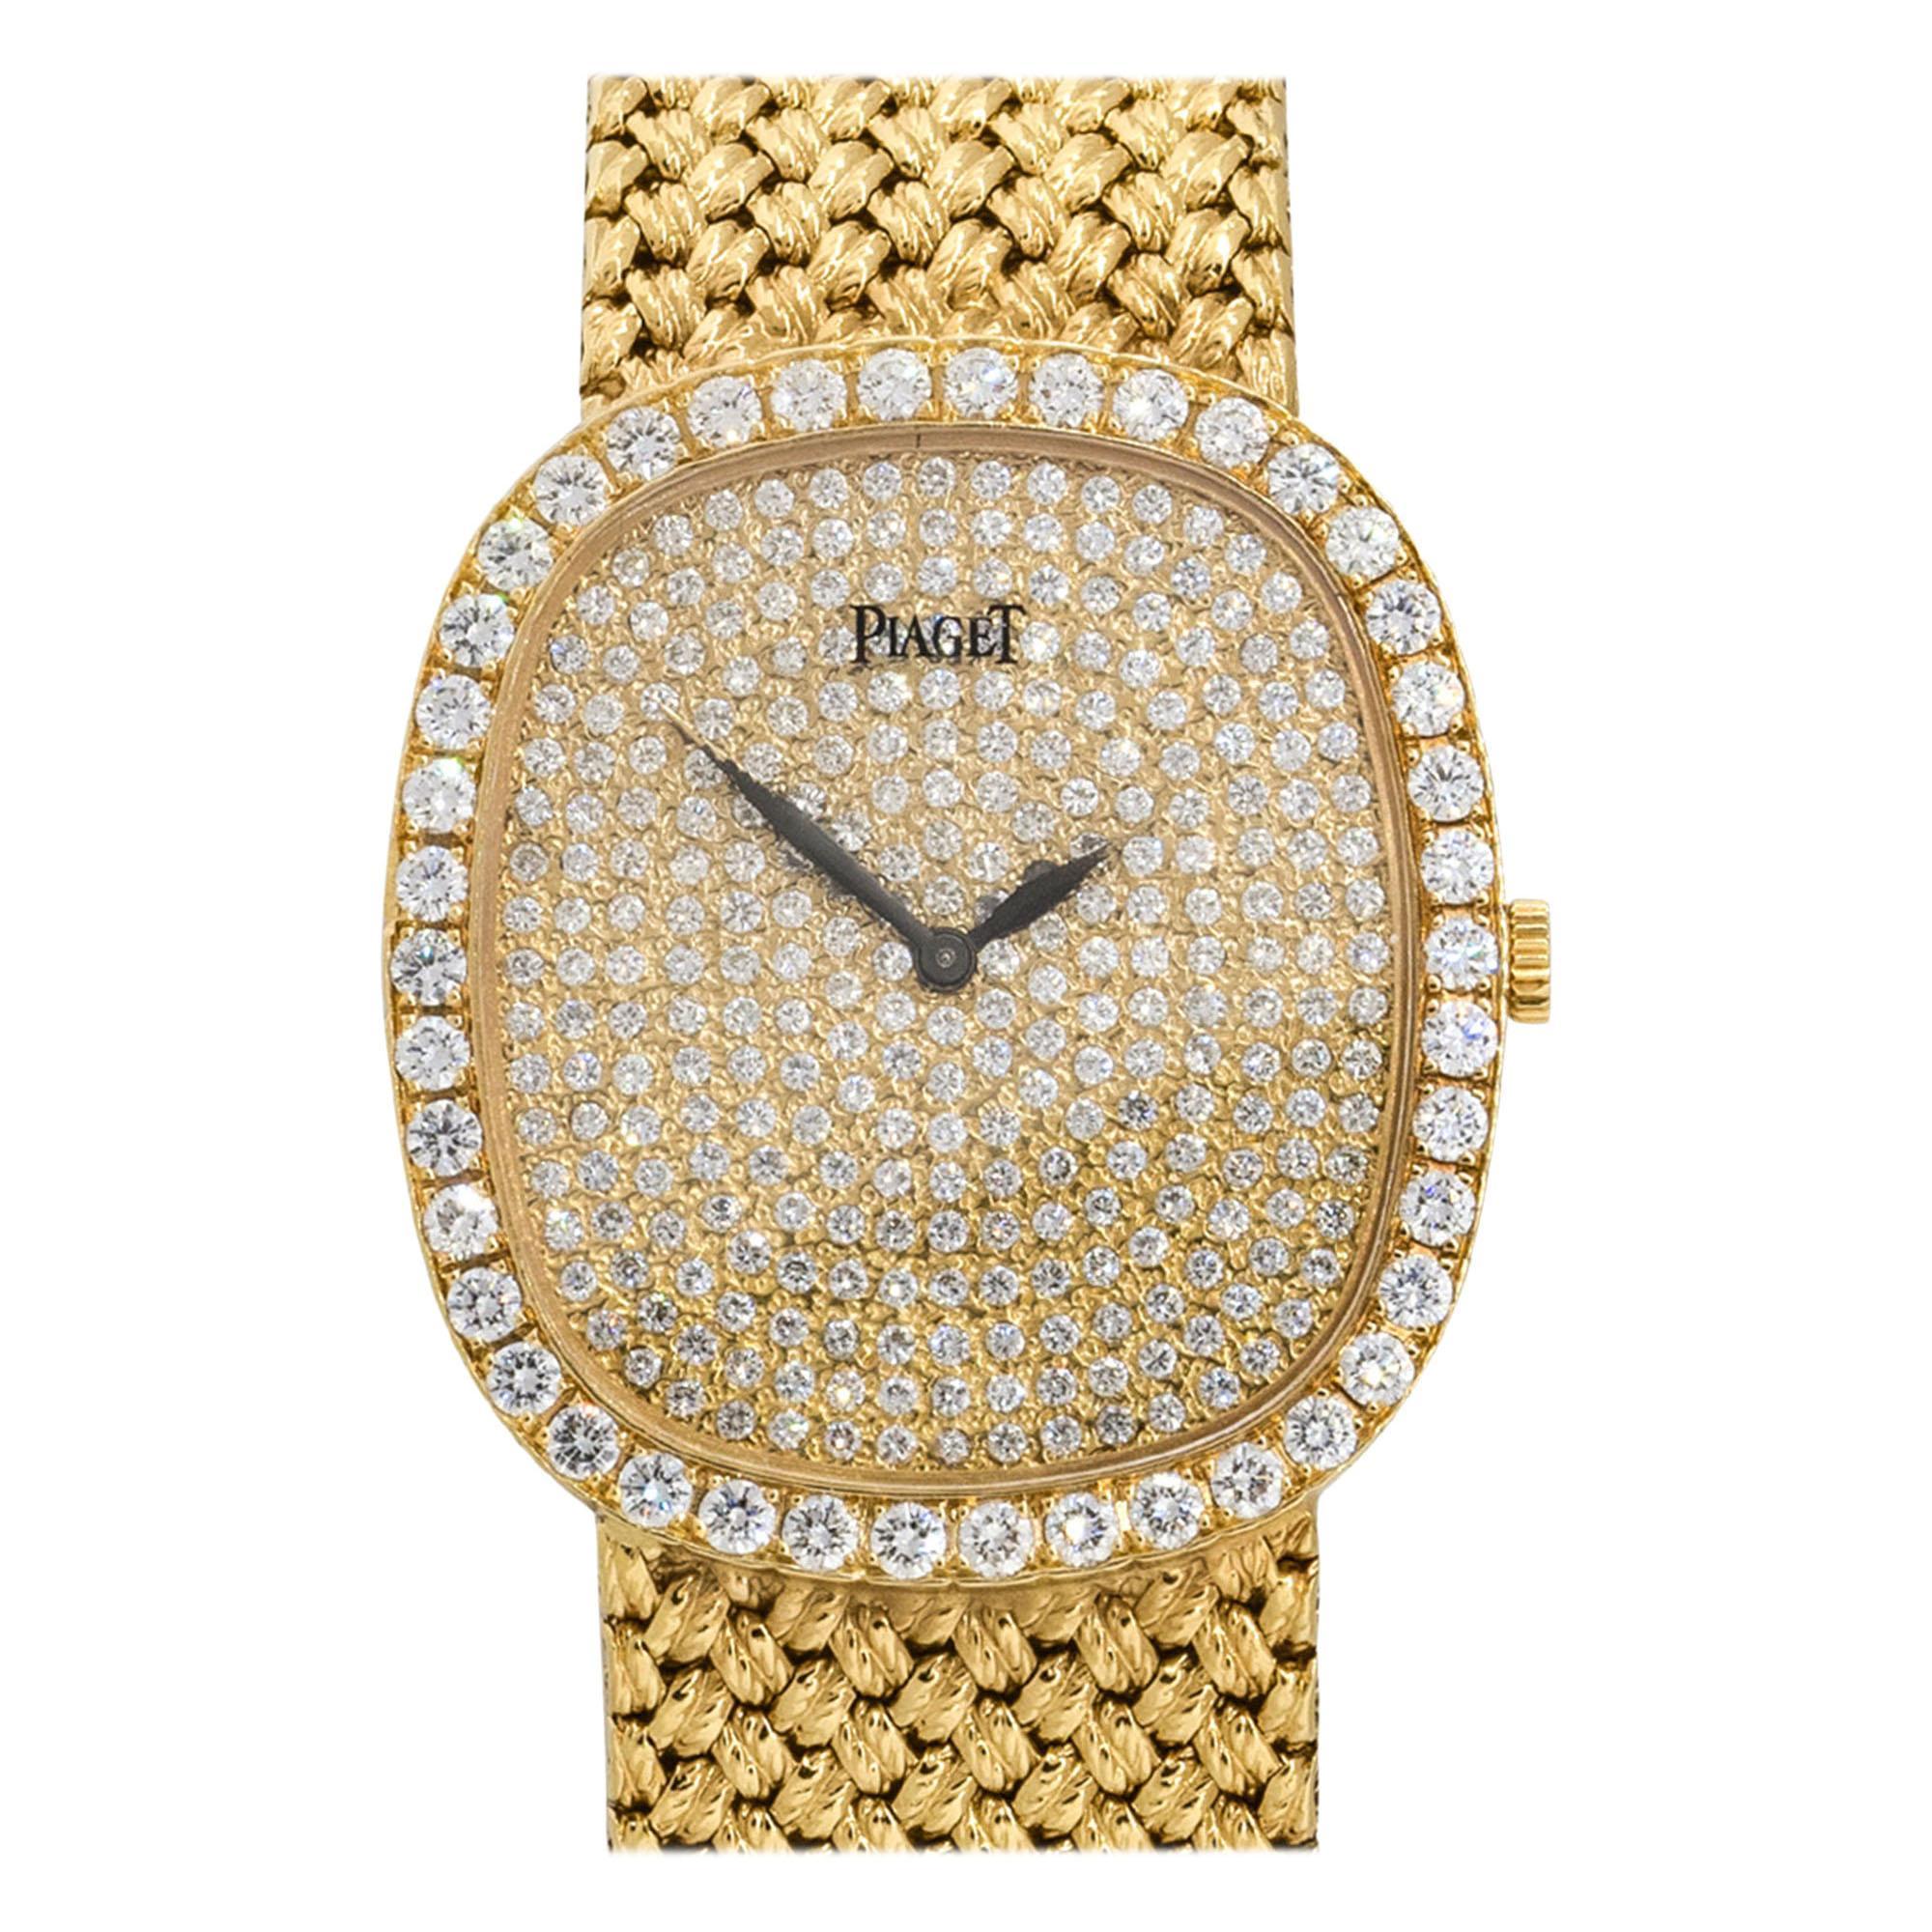 Piaget 94431D4 18k Yellow Gold Diamond Pave Ladies Watch